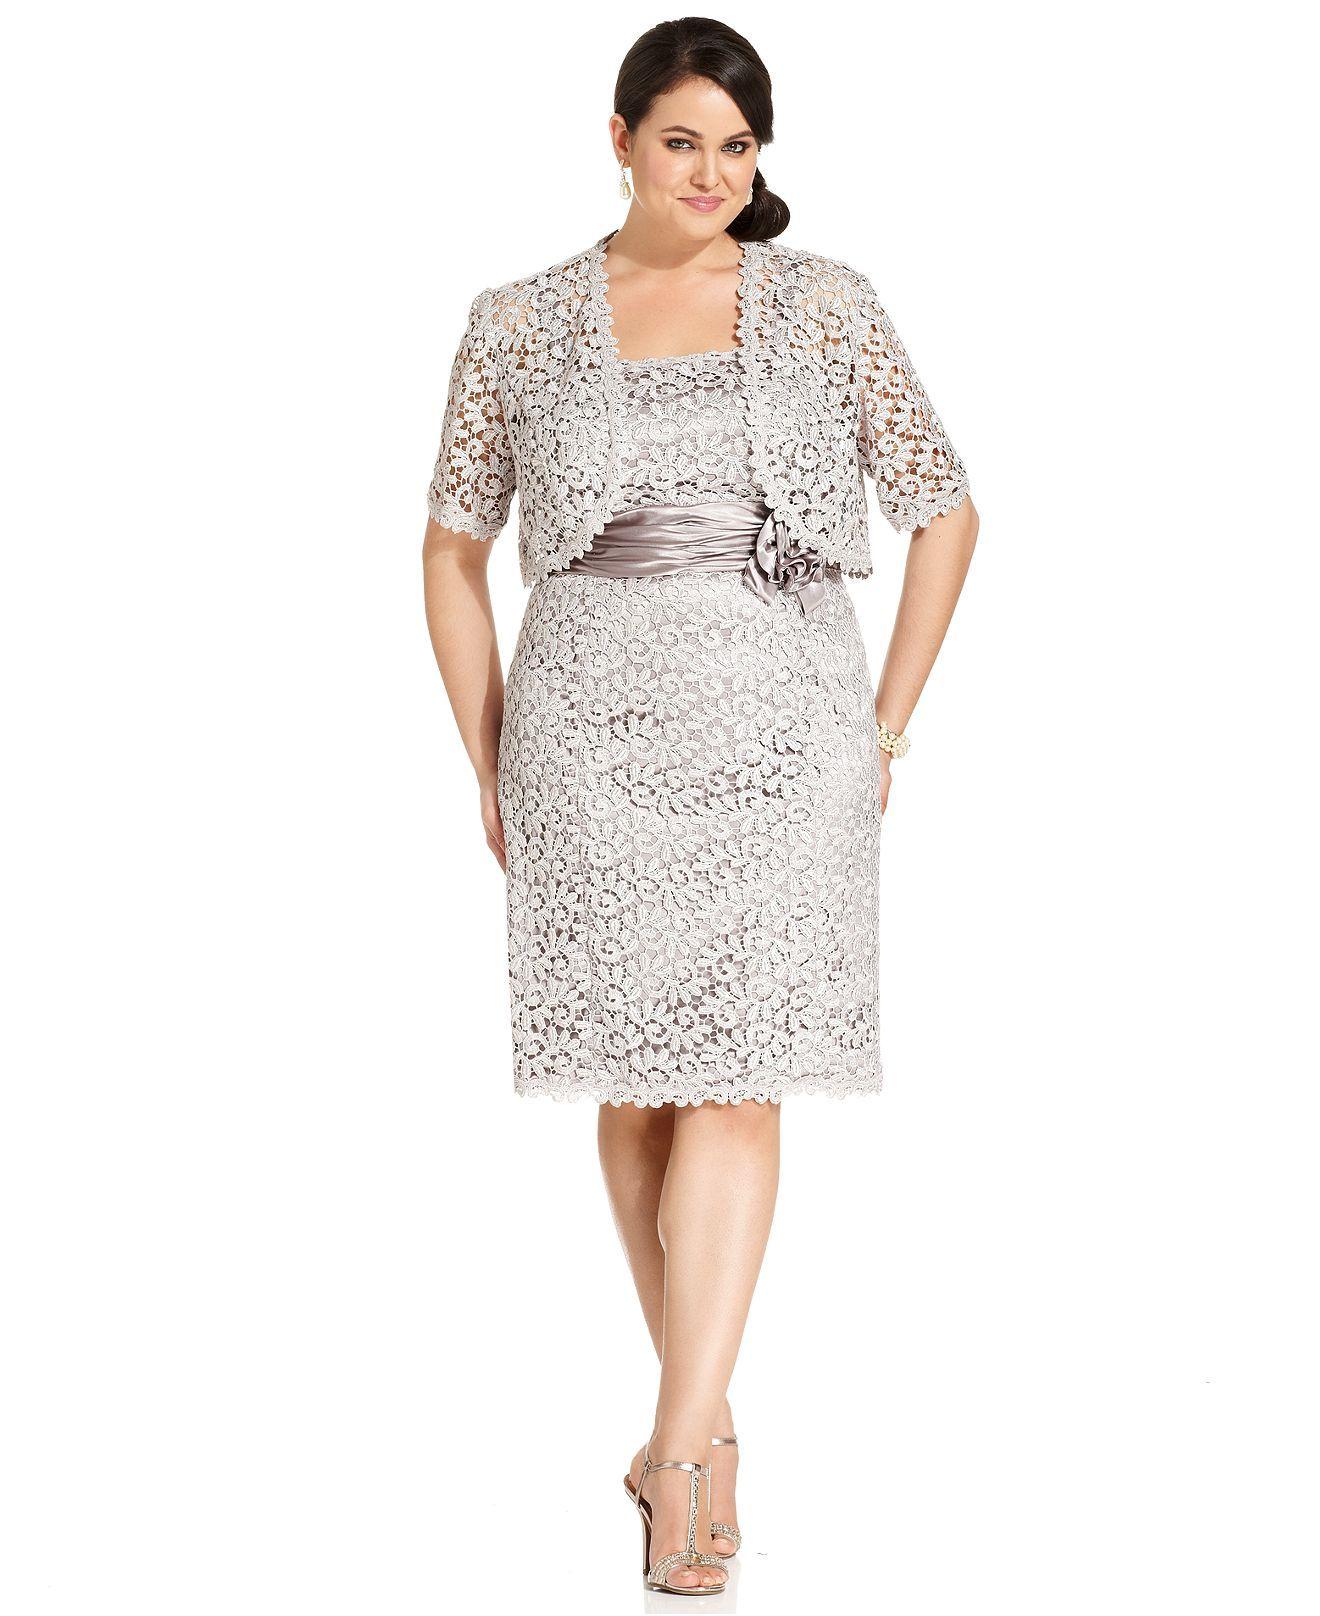 R Richards Plus Size Dress and Jacket, Sleeveless Crochet-Lace ...